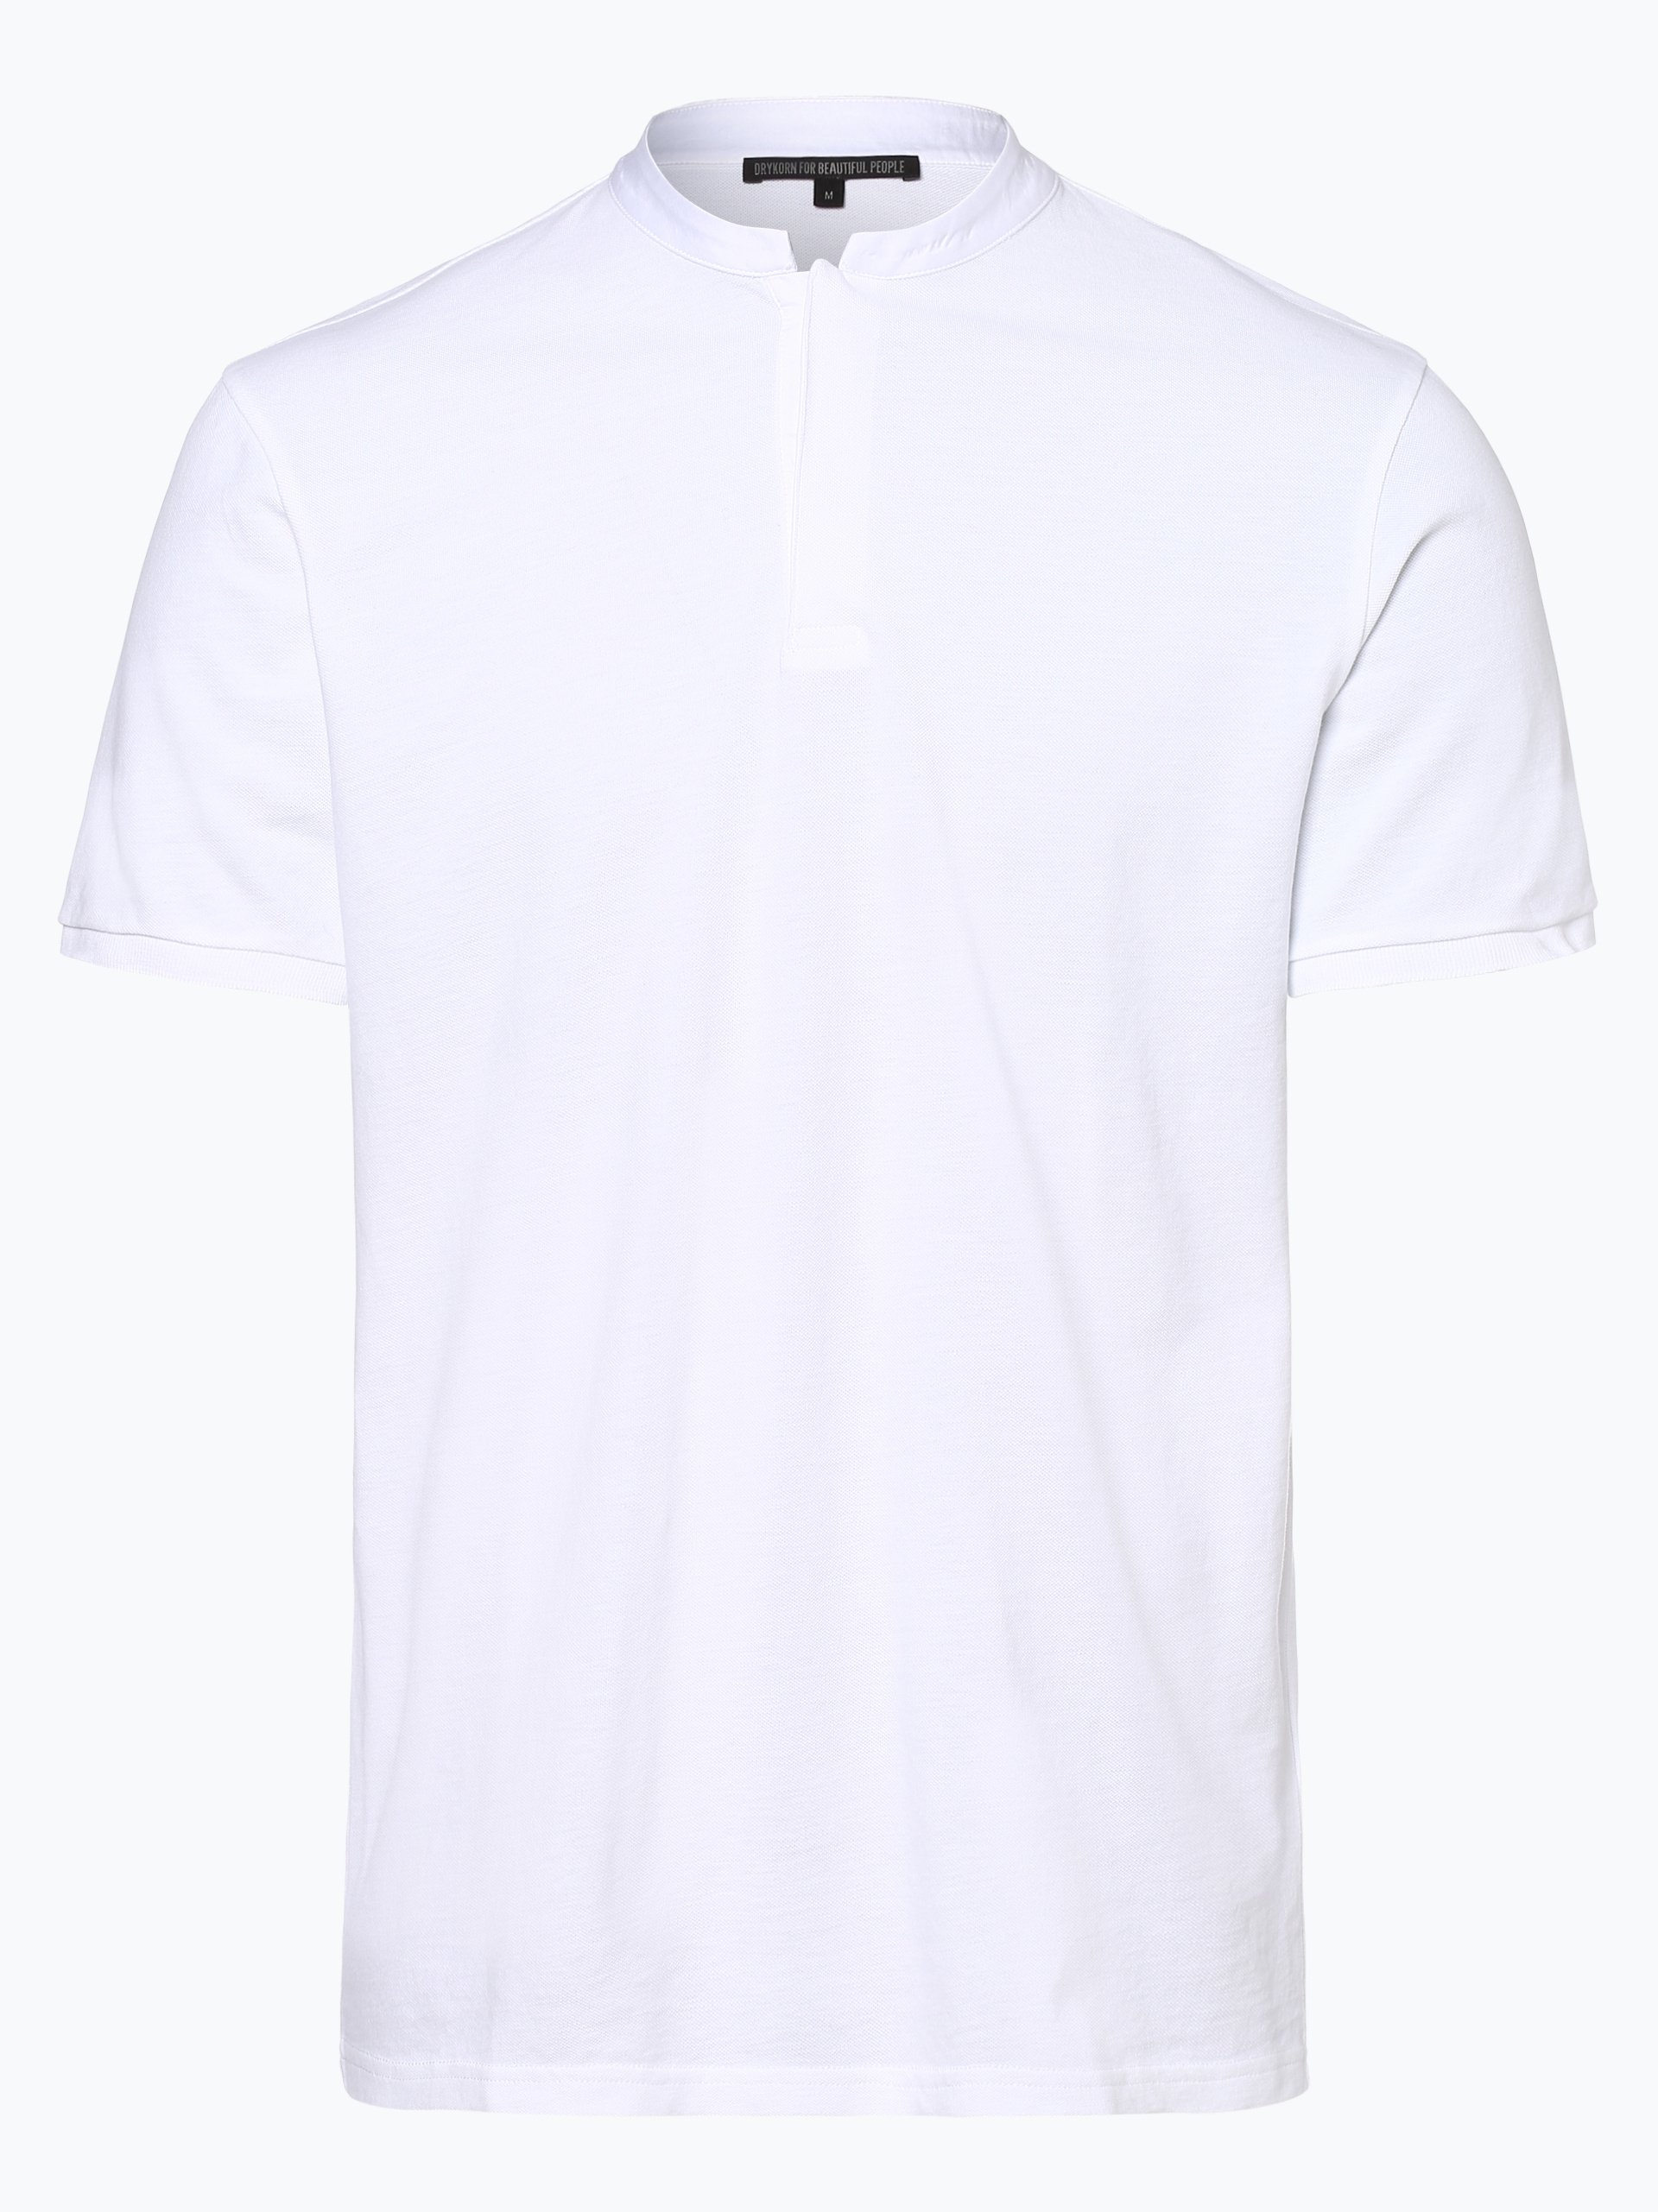 Drykorn Herren T-Shirt